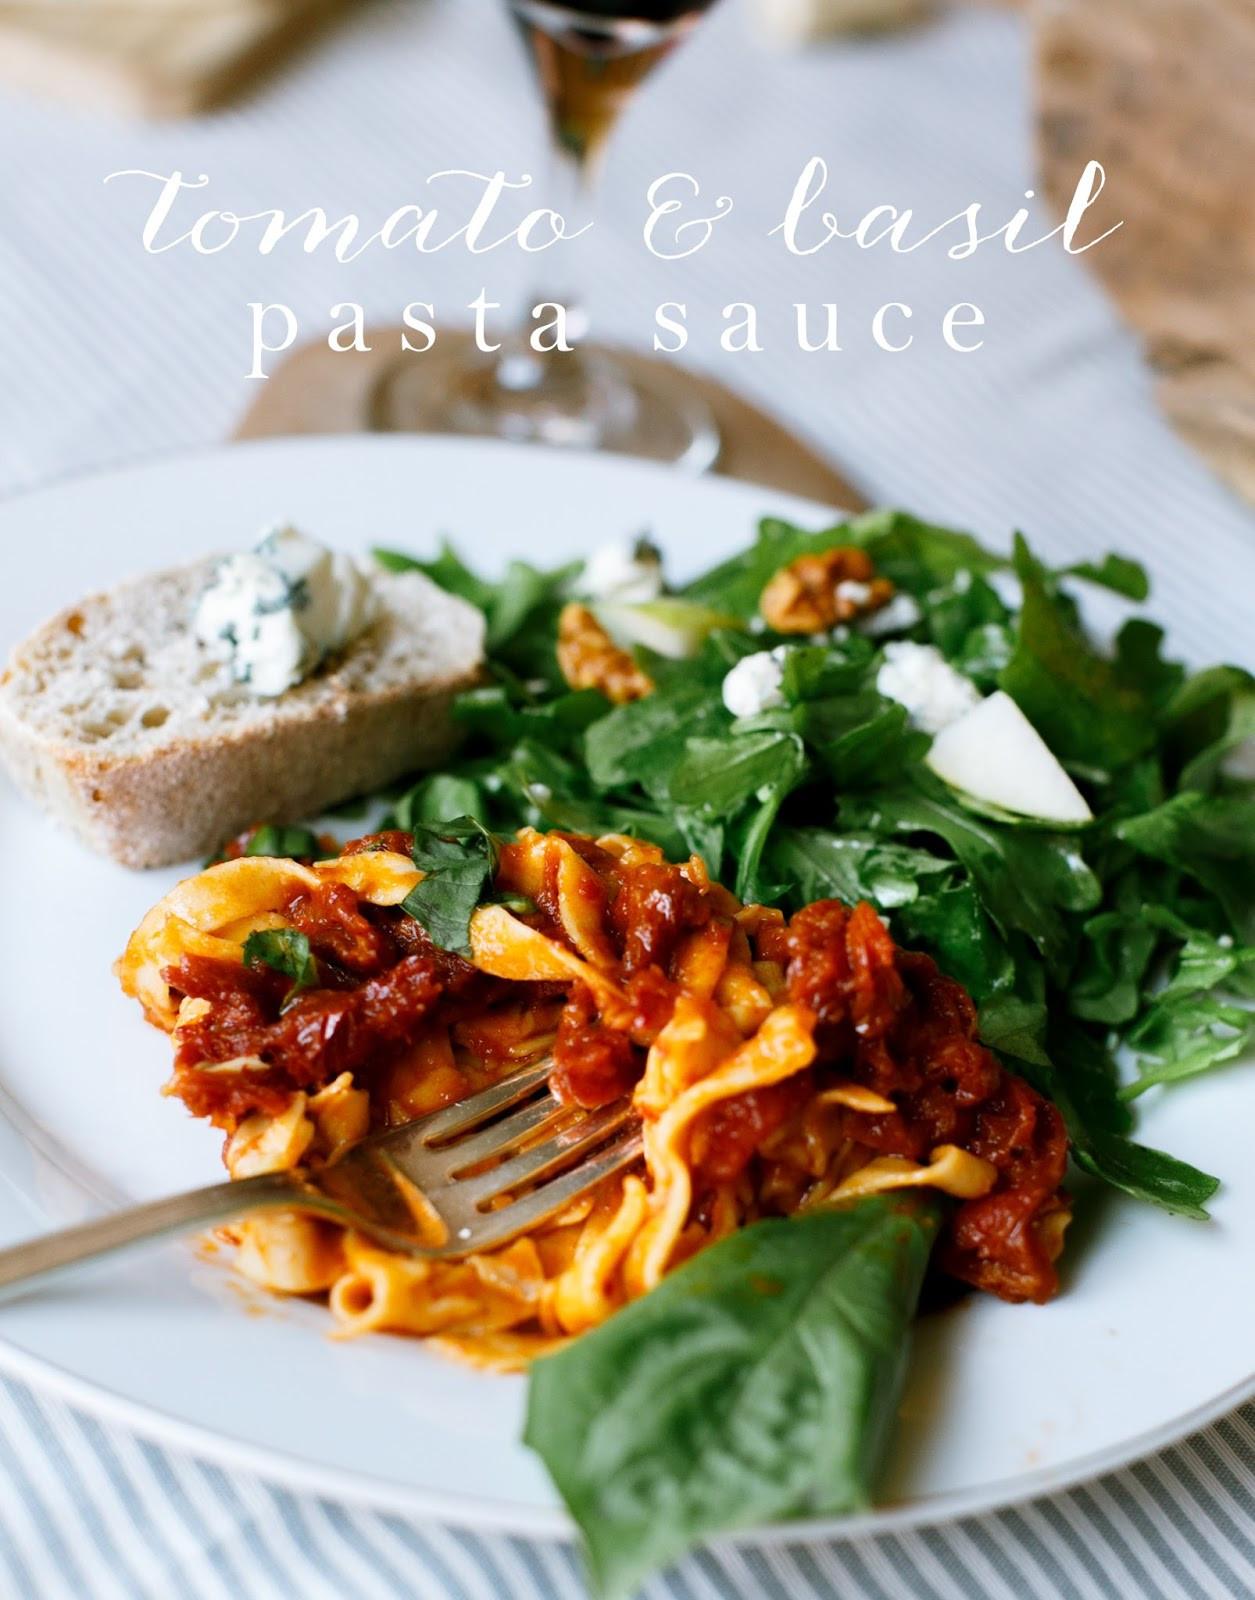 Tomato Basil Pasta Sauce  Tomato Basil Pasta Sauce